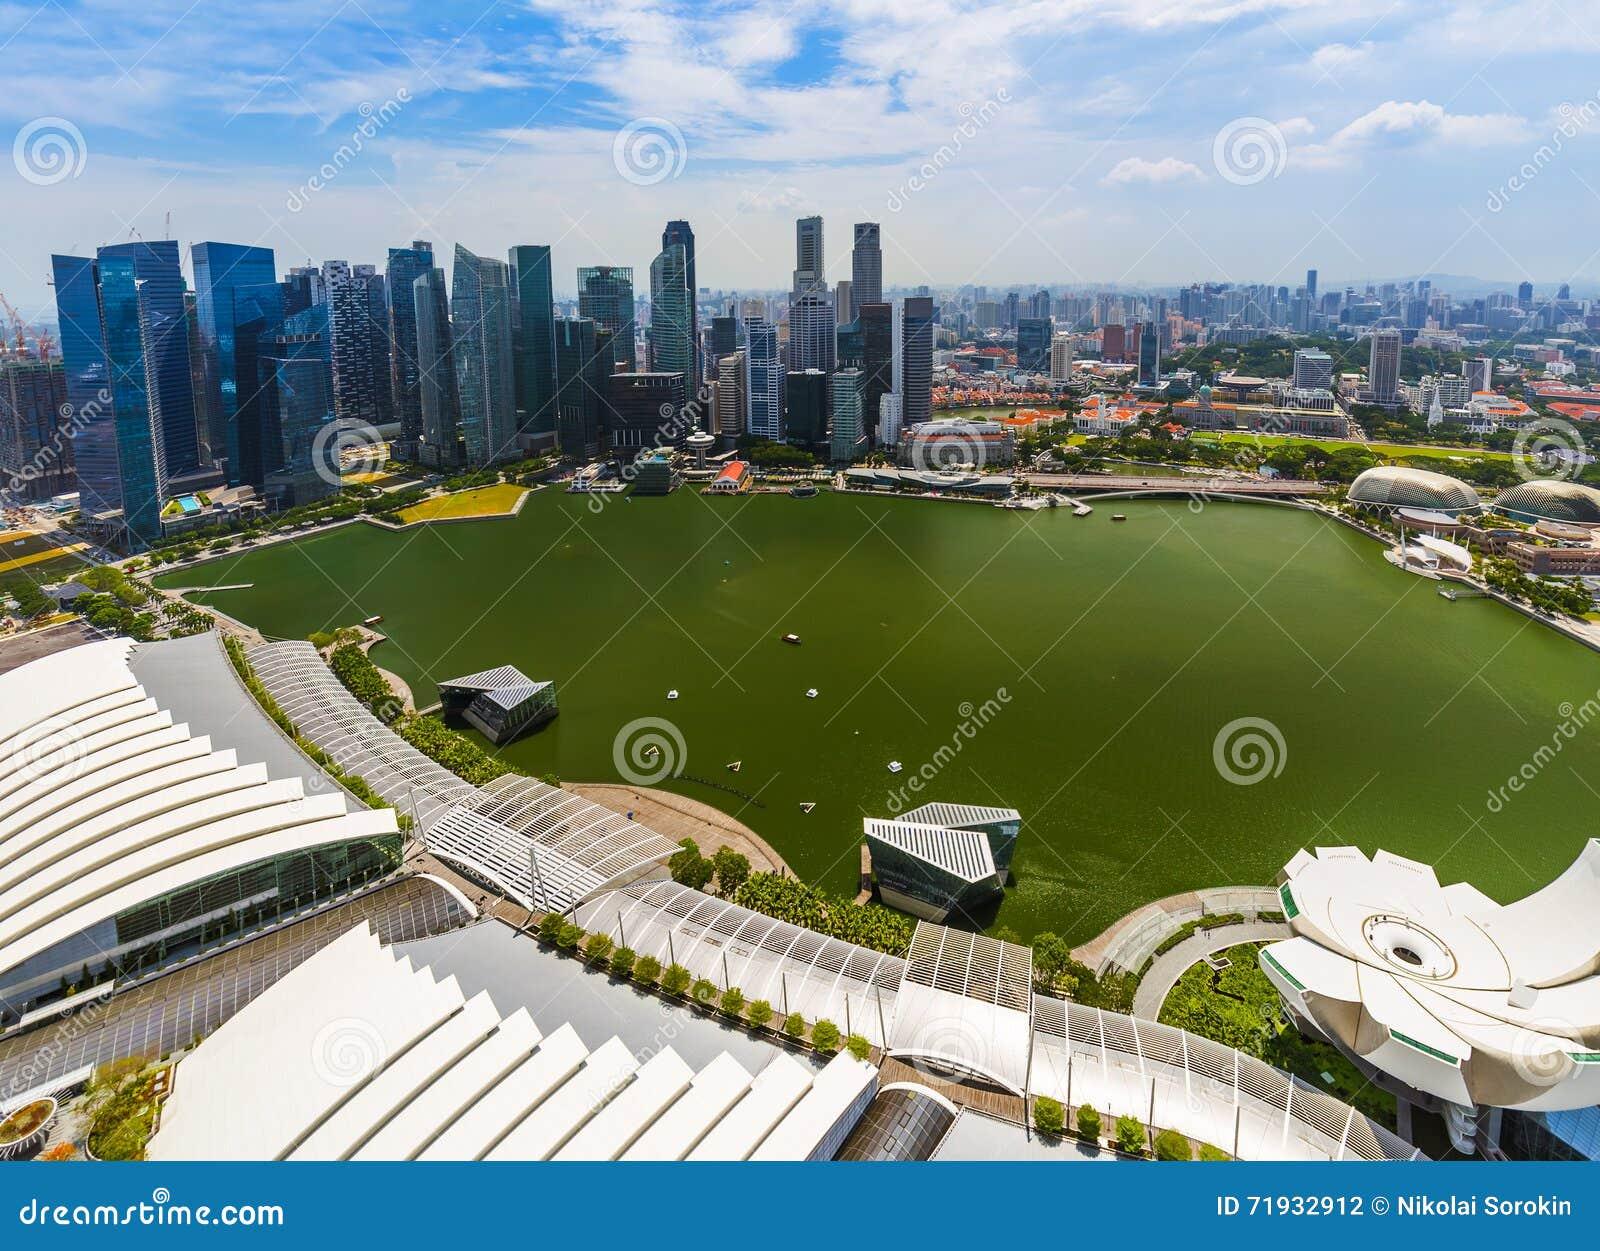 Горизонт города Сингапура